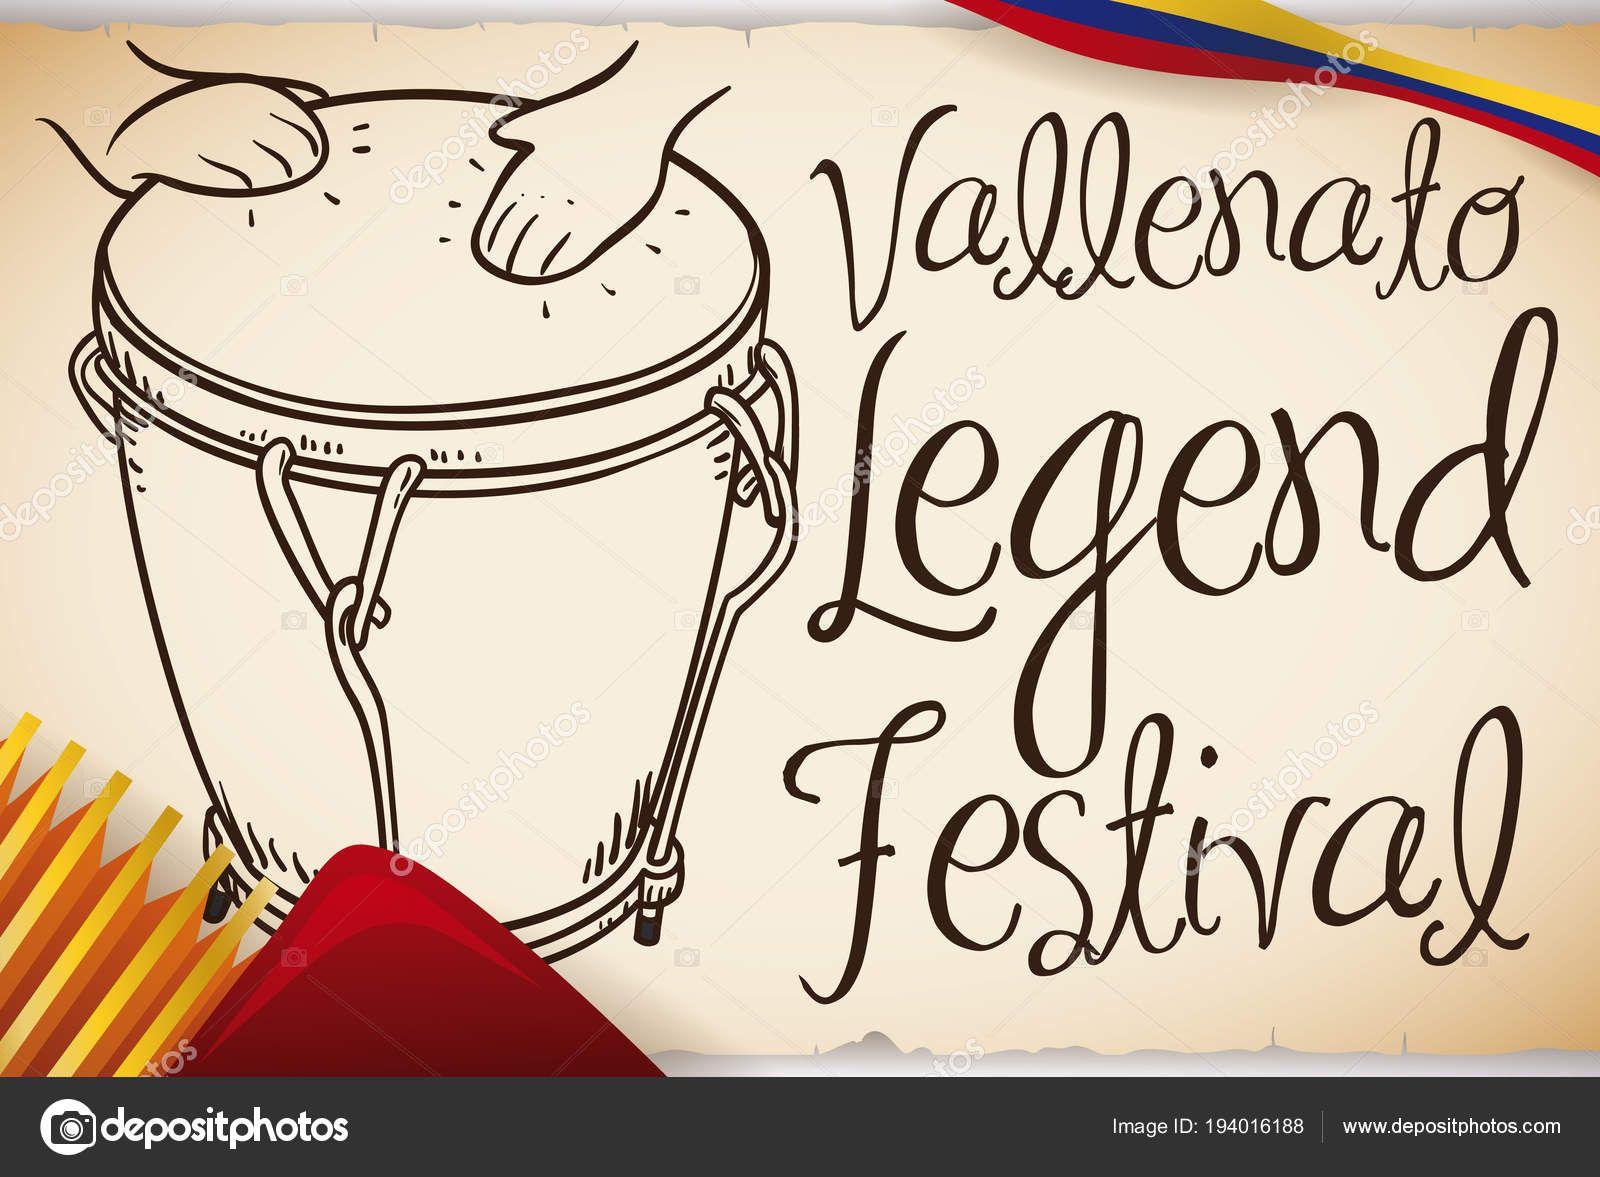 Mano Dibujada Caja Vallenata Con Acordeon Para Festival De La Leyenda Vallenata